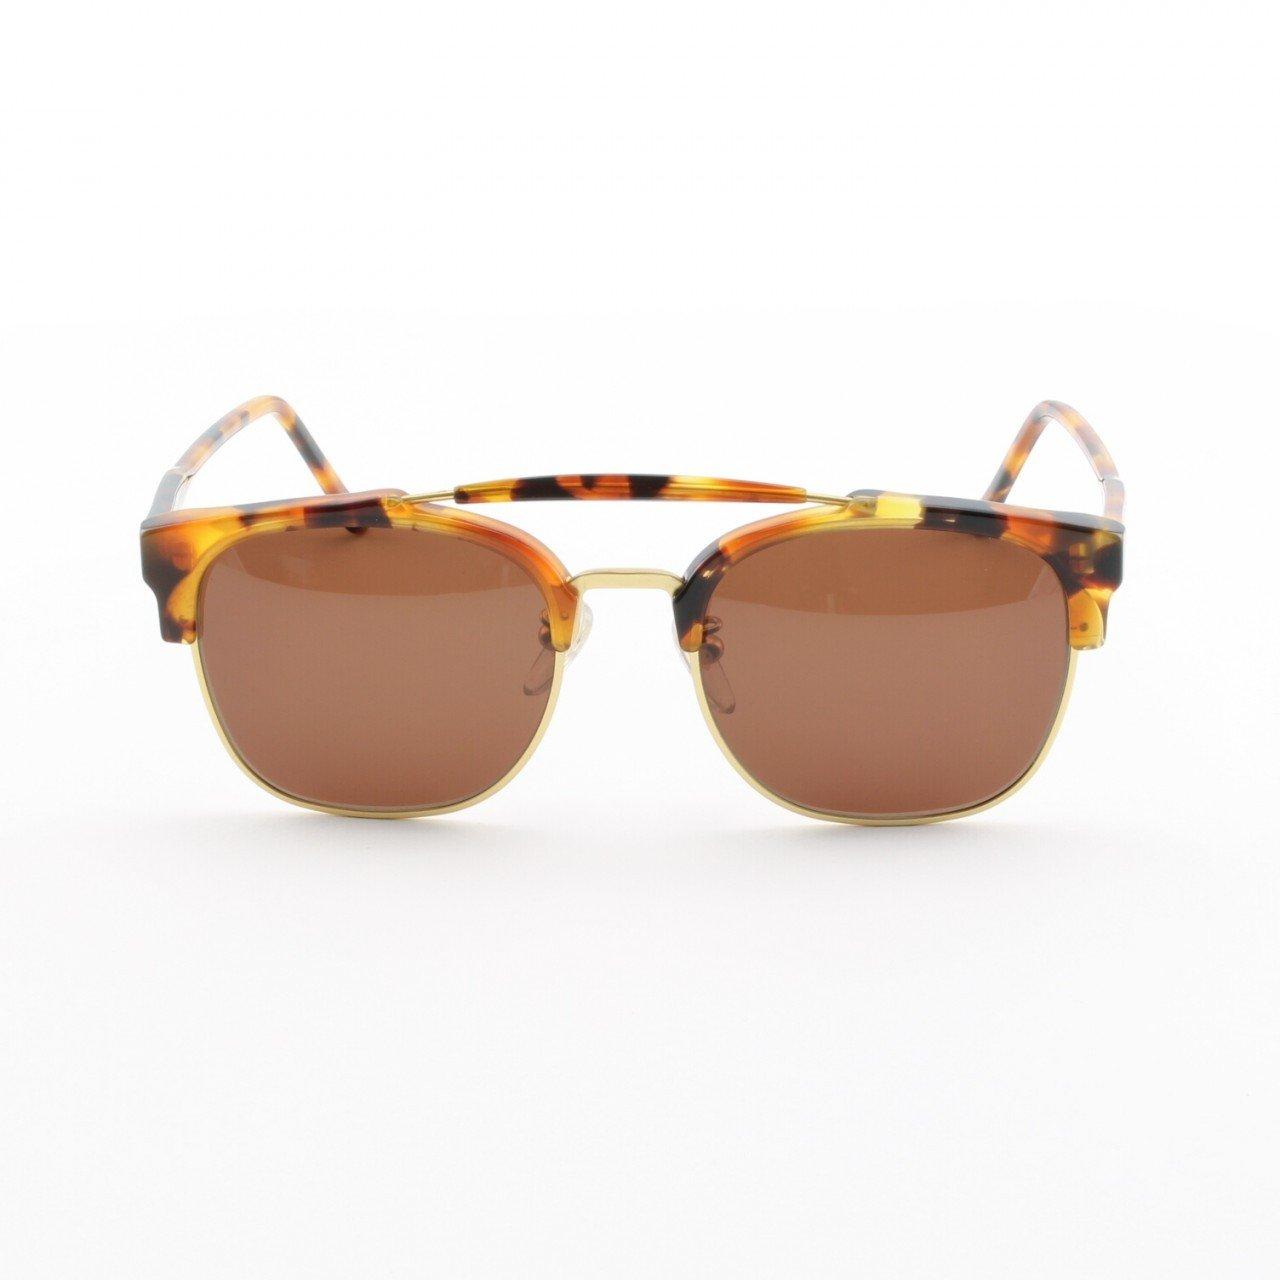 Super 49er 467 Sunglasses Dark Havana with Brown Zeiss Lenses by RETROSUPERFUTURE